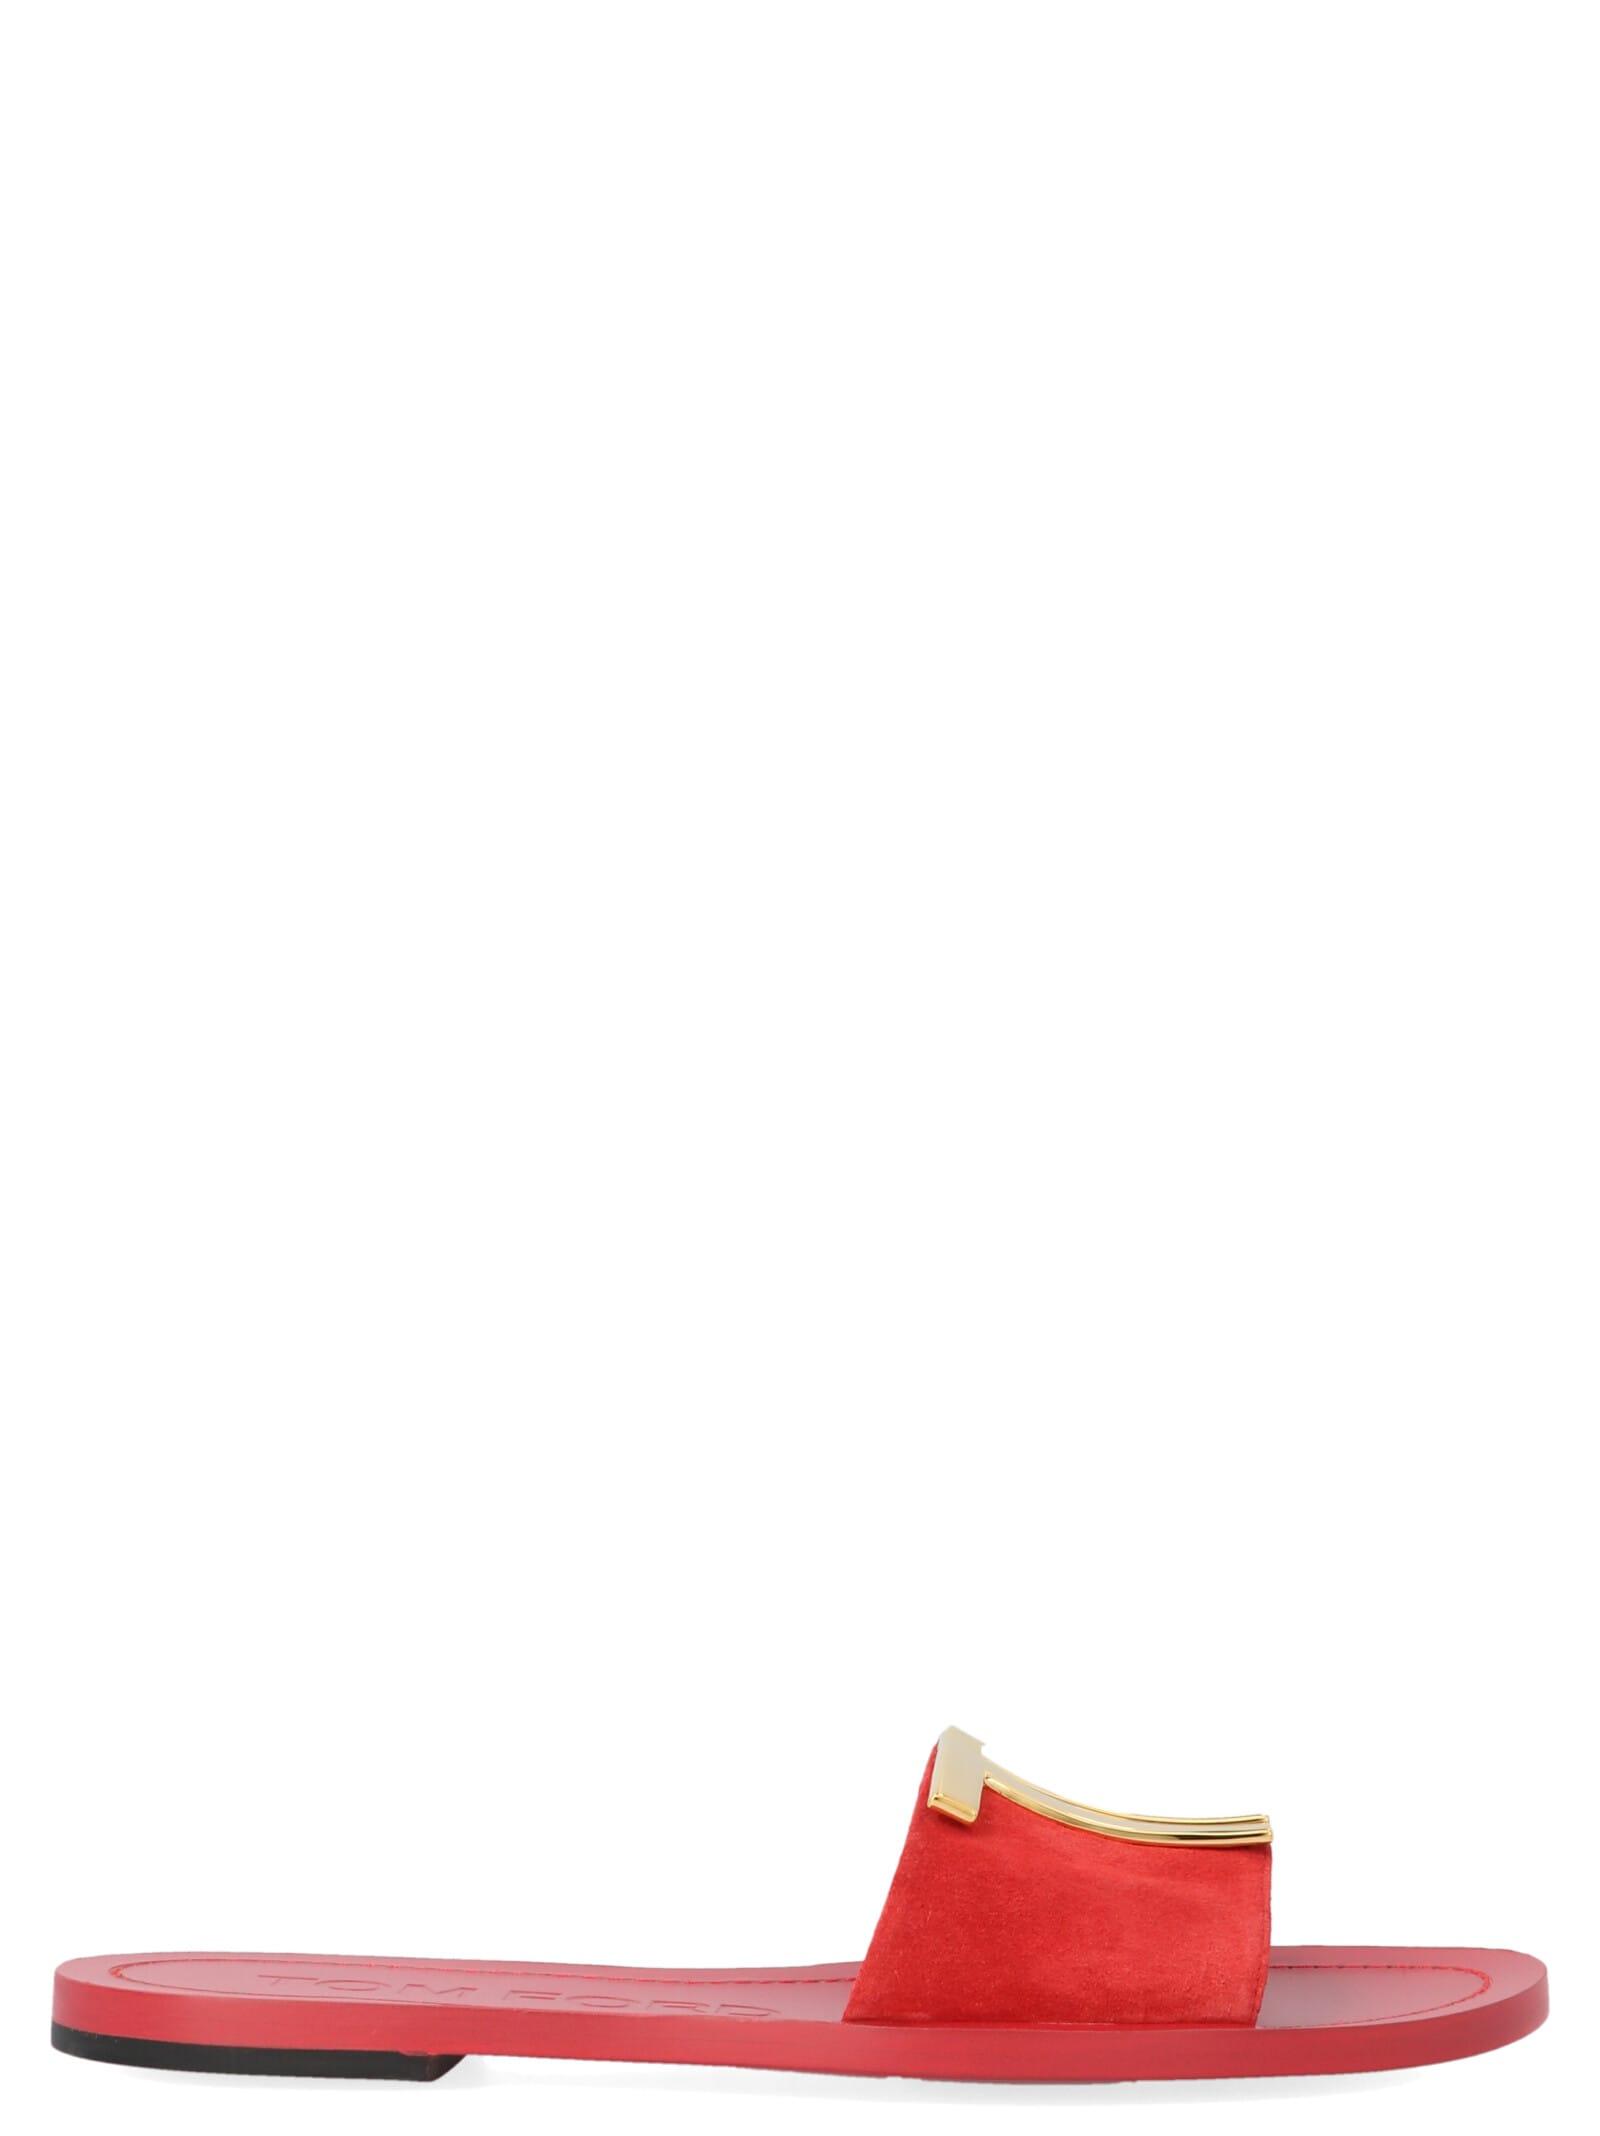 Tom Ford Sandals | italist, ALWAYS LIKE